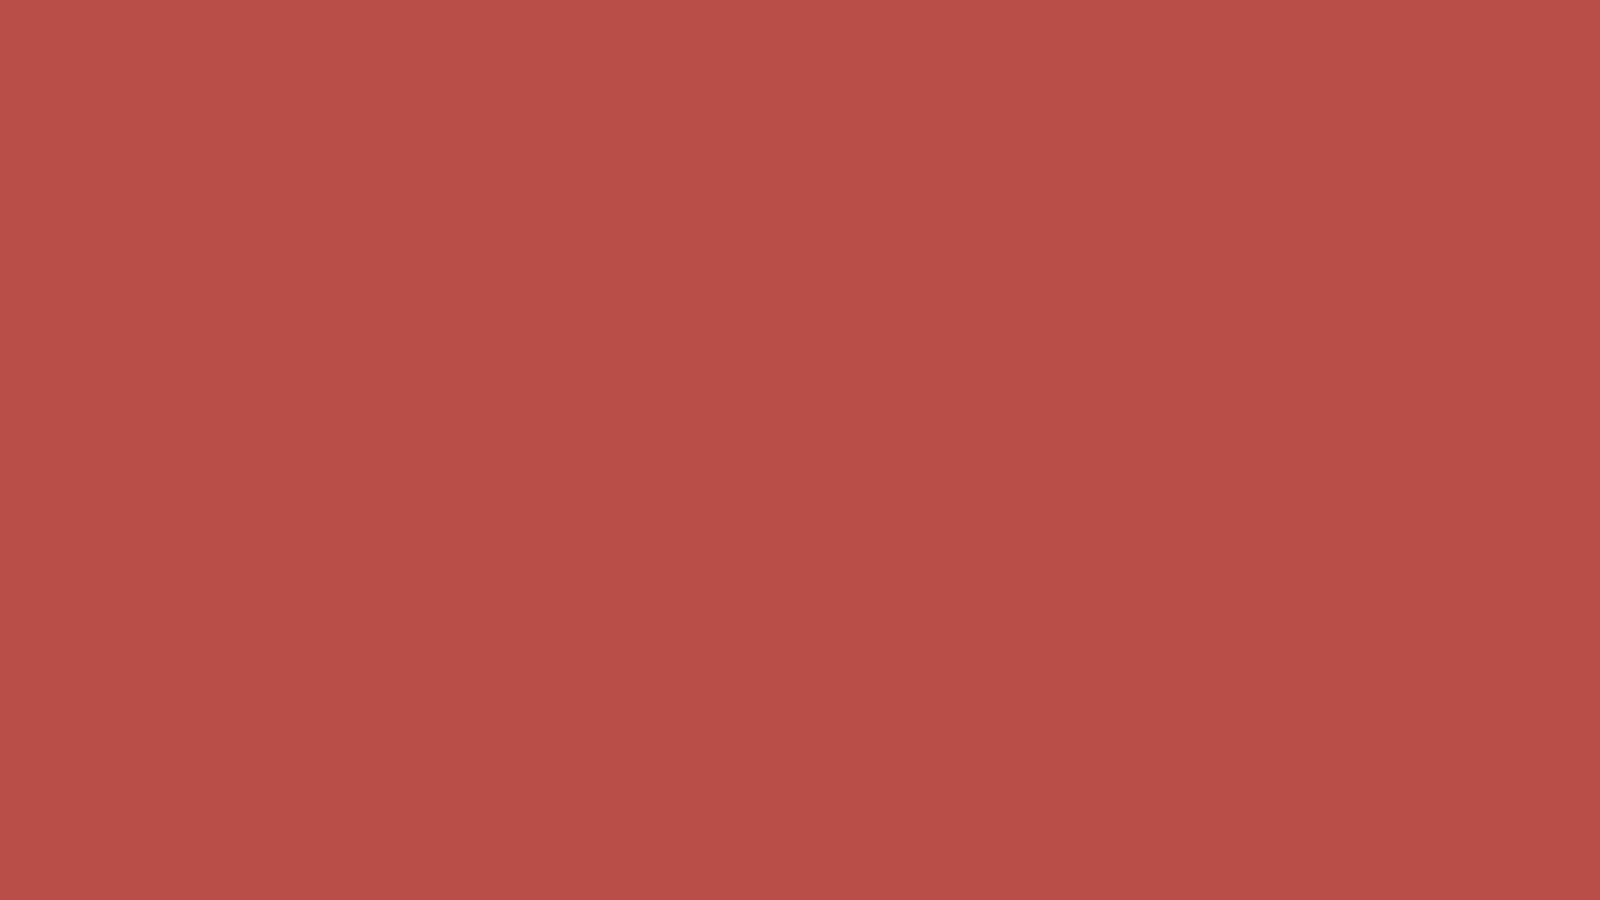 1600x900 Deep Chestnut Solid Color Background